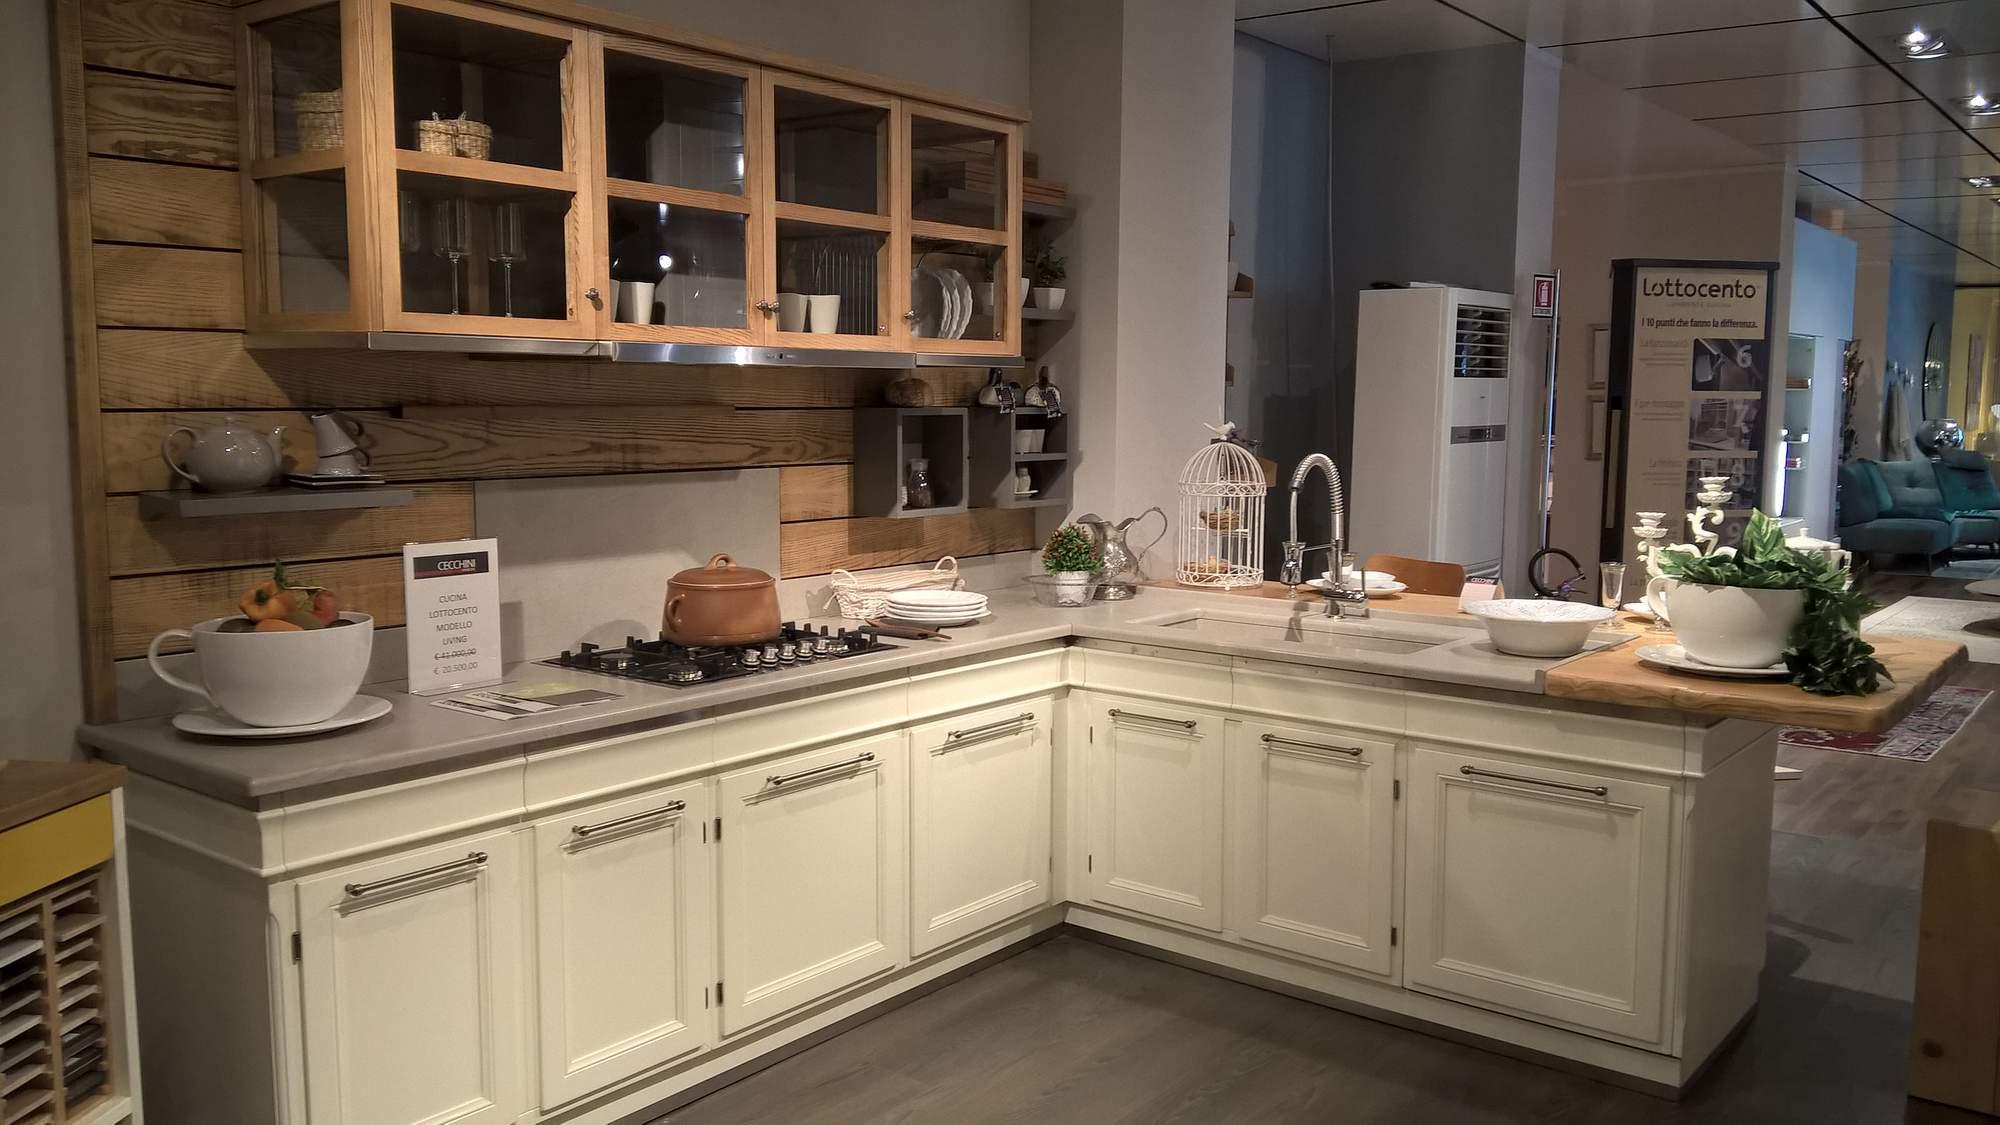 lottocento cucine - 28 images - l ottocento cucine artigianali in ...